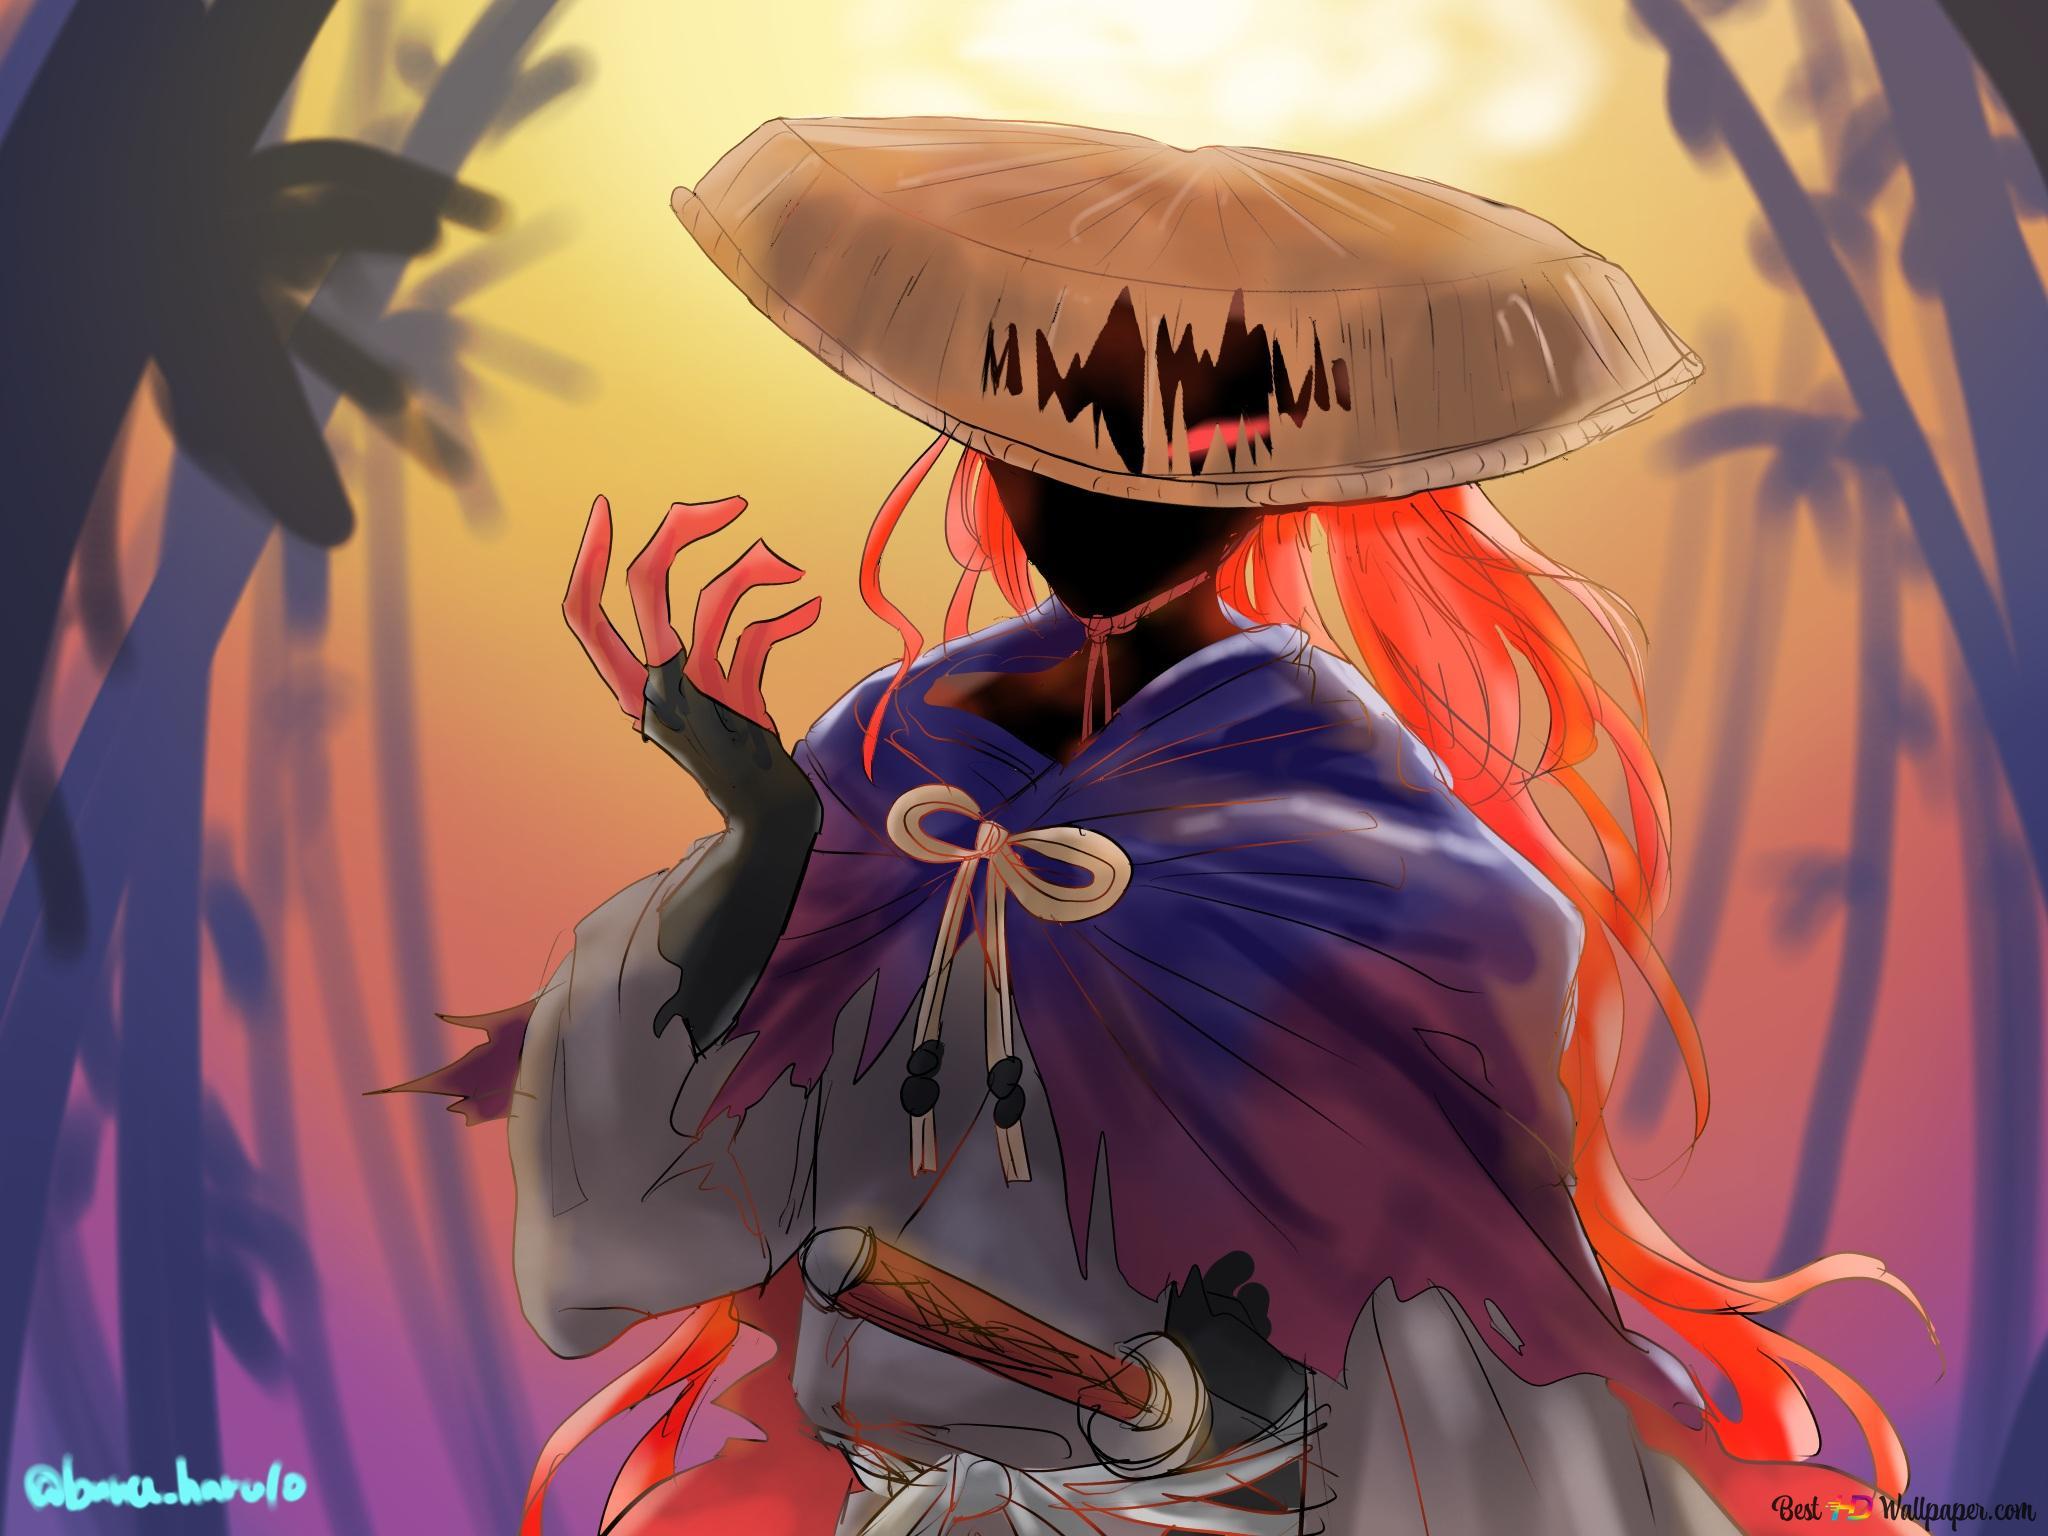 Fate/Grand Order - Okada Izou HD wallpaper download